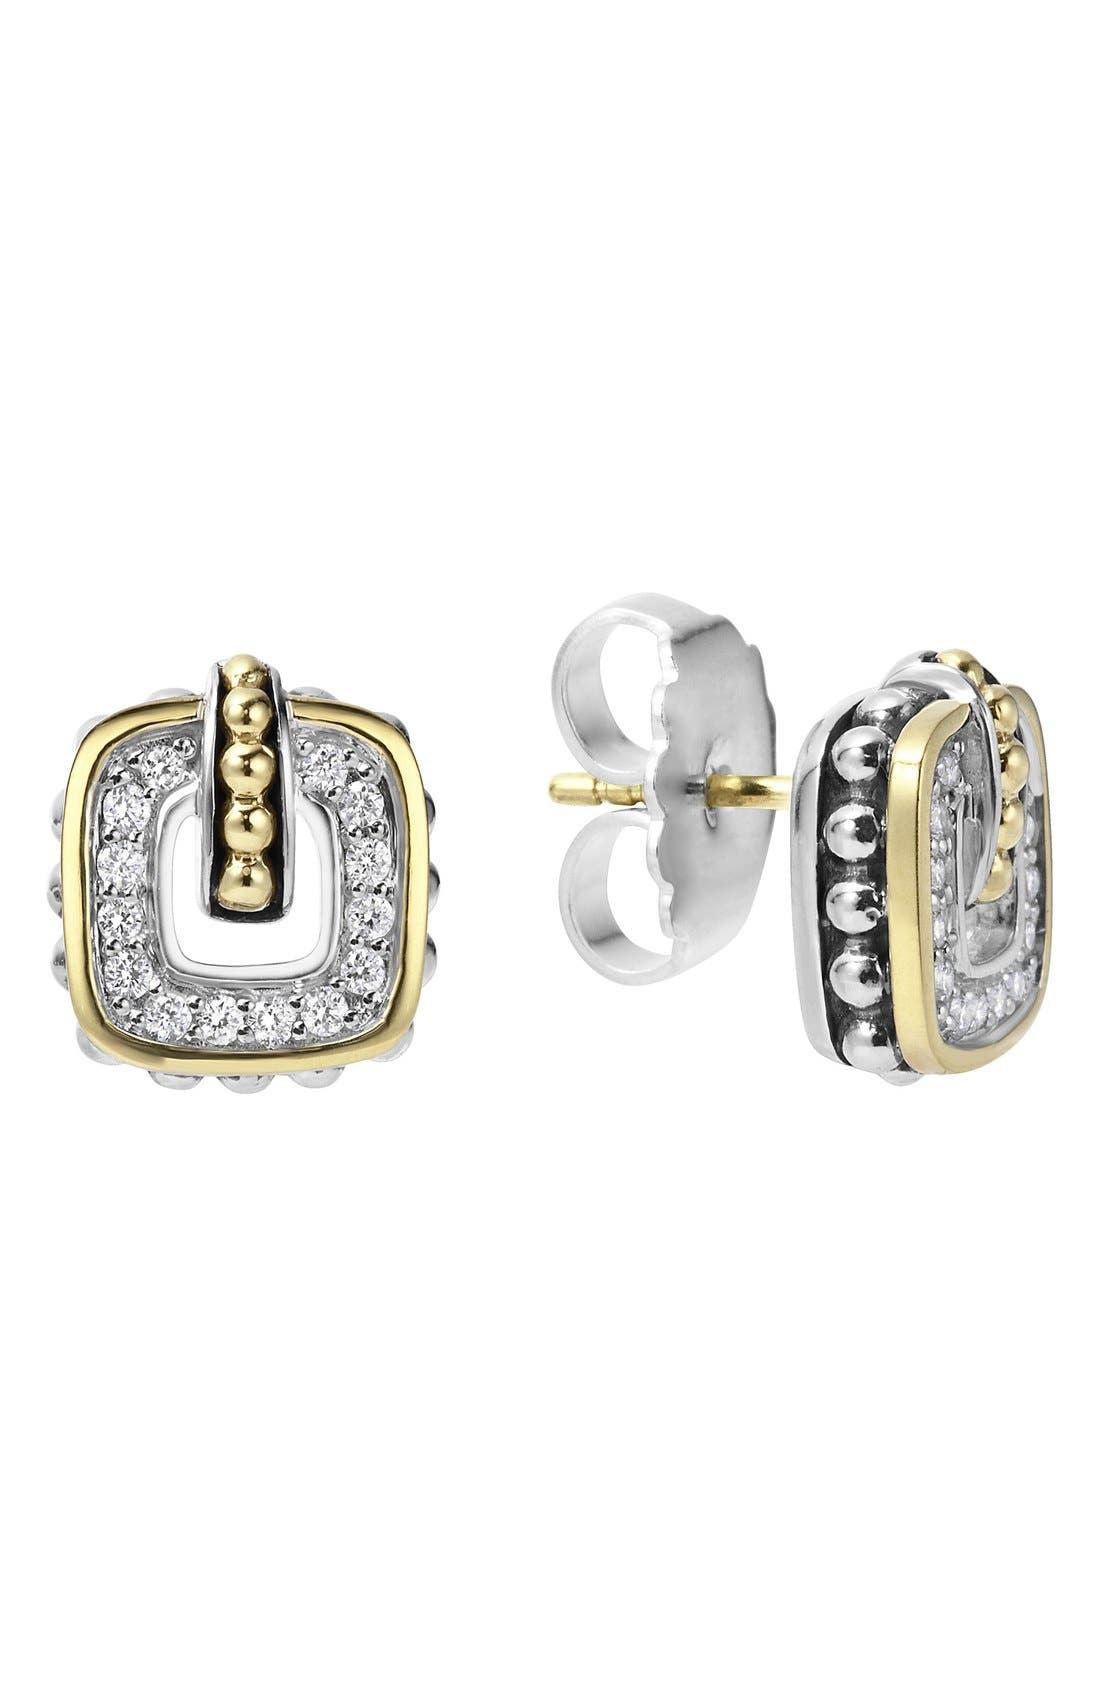 LAGOS 'Cushion' Stud Earrings